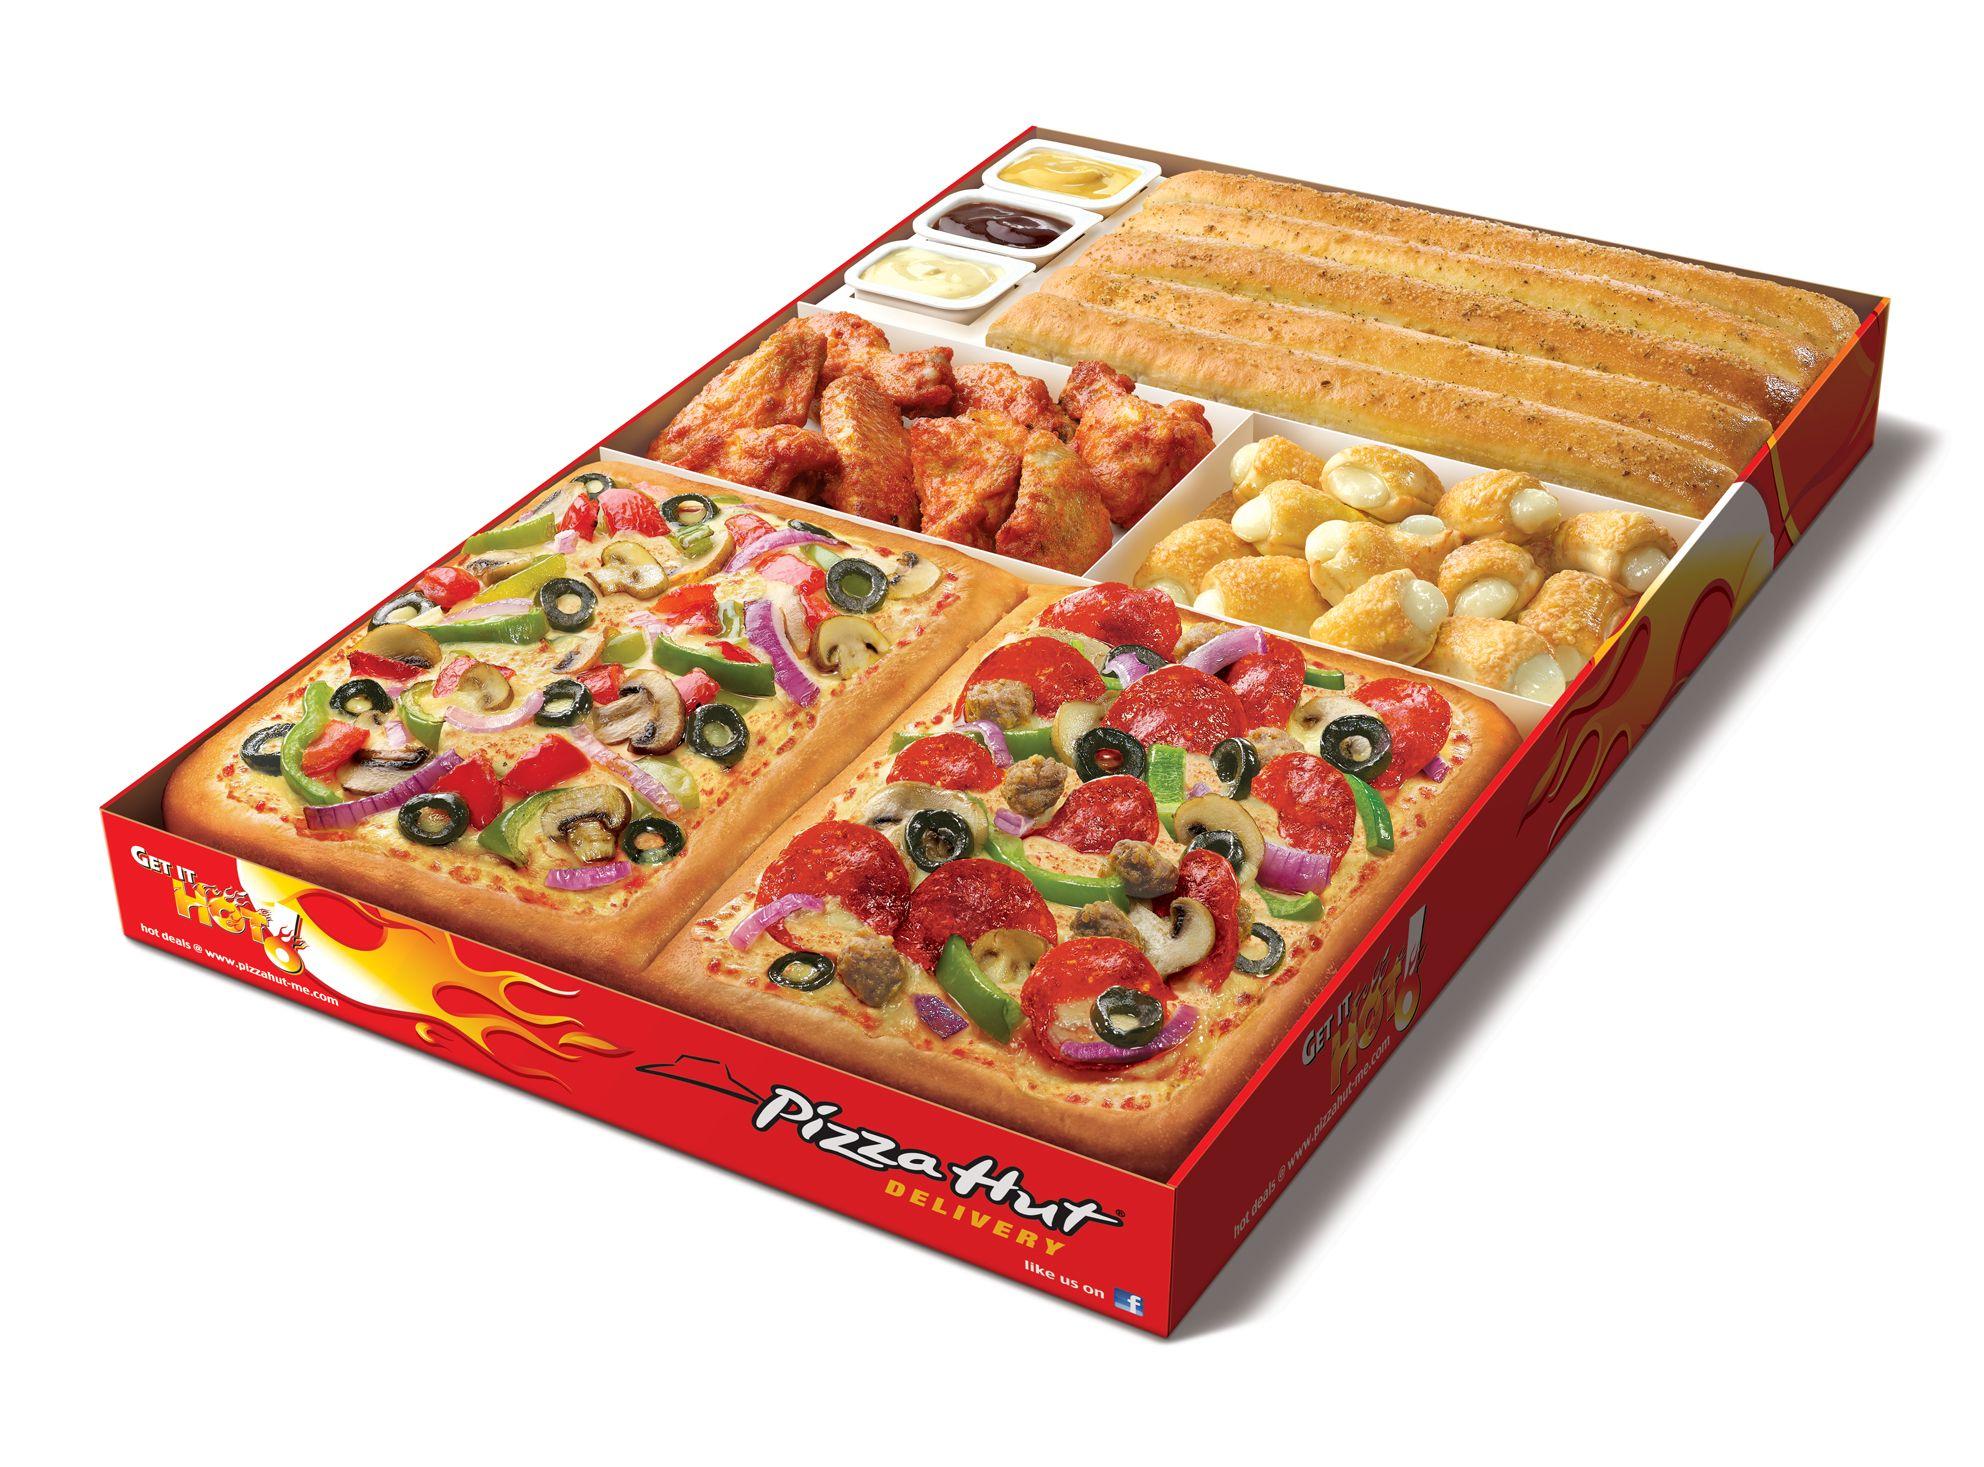 All In One Box Pizza Hut Pizza 5 Dollar Box